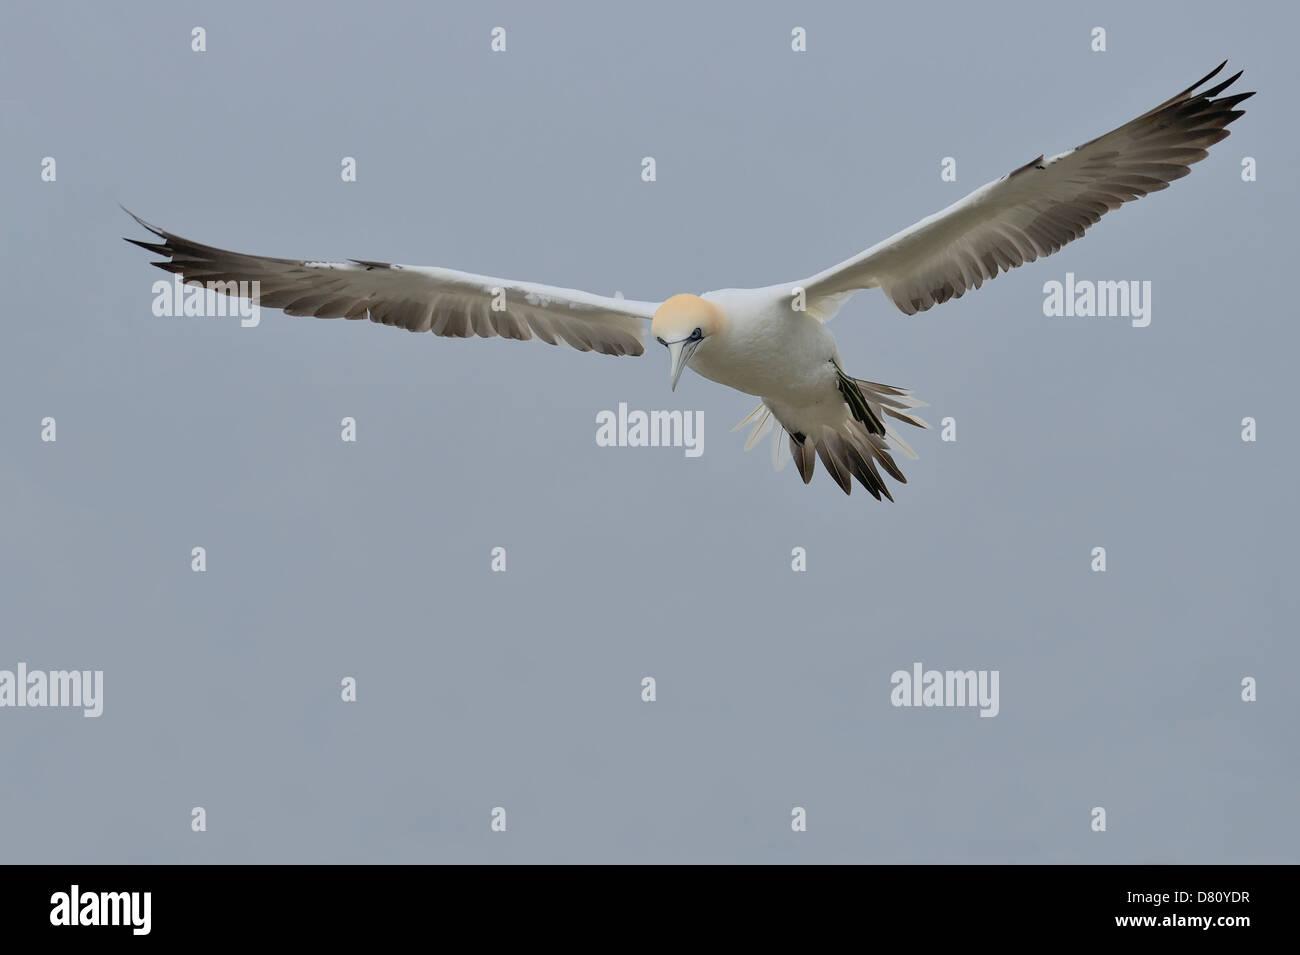 A northern gannet (Morus bassanus, Sula bassana) soaring gracefully above the North Sea. - Stock Image